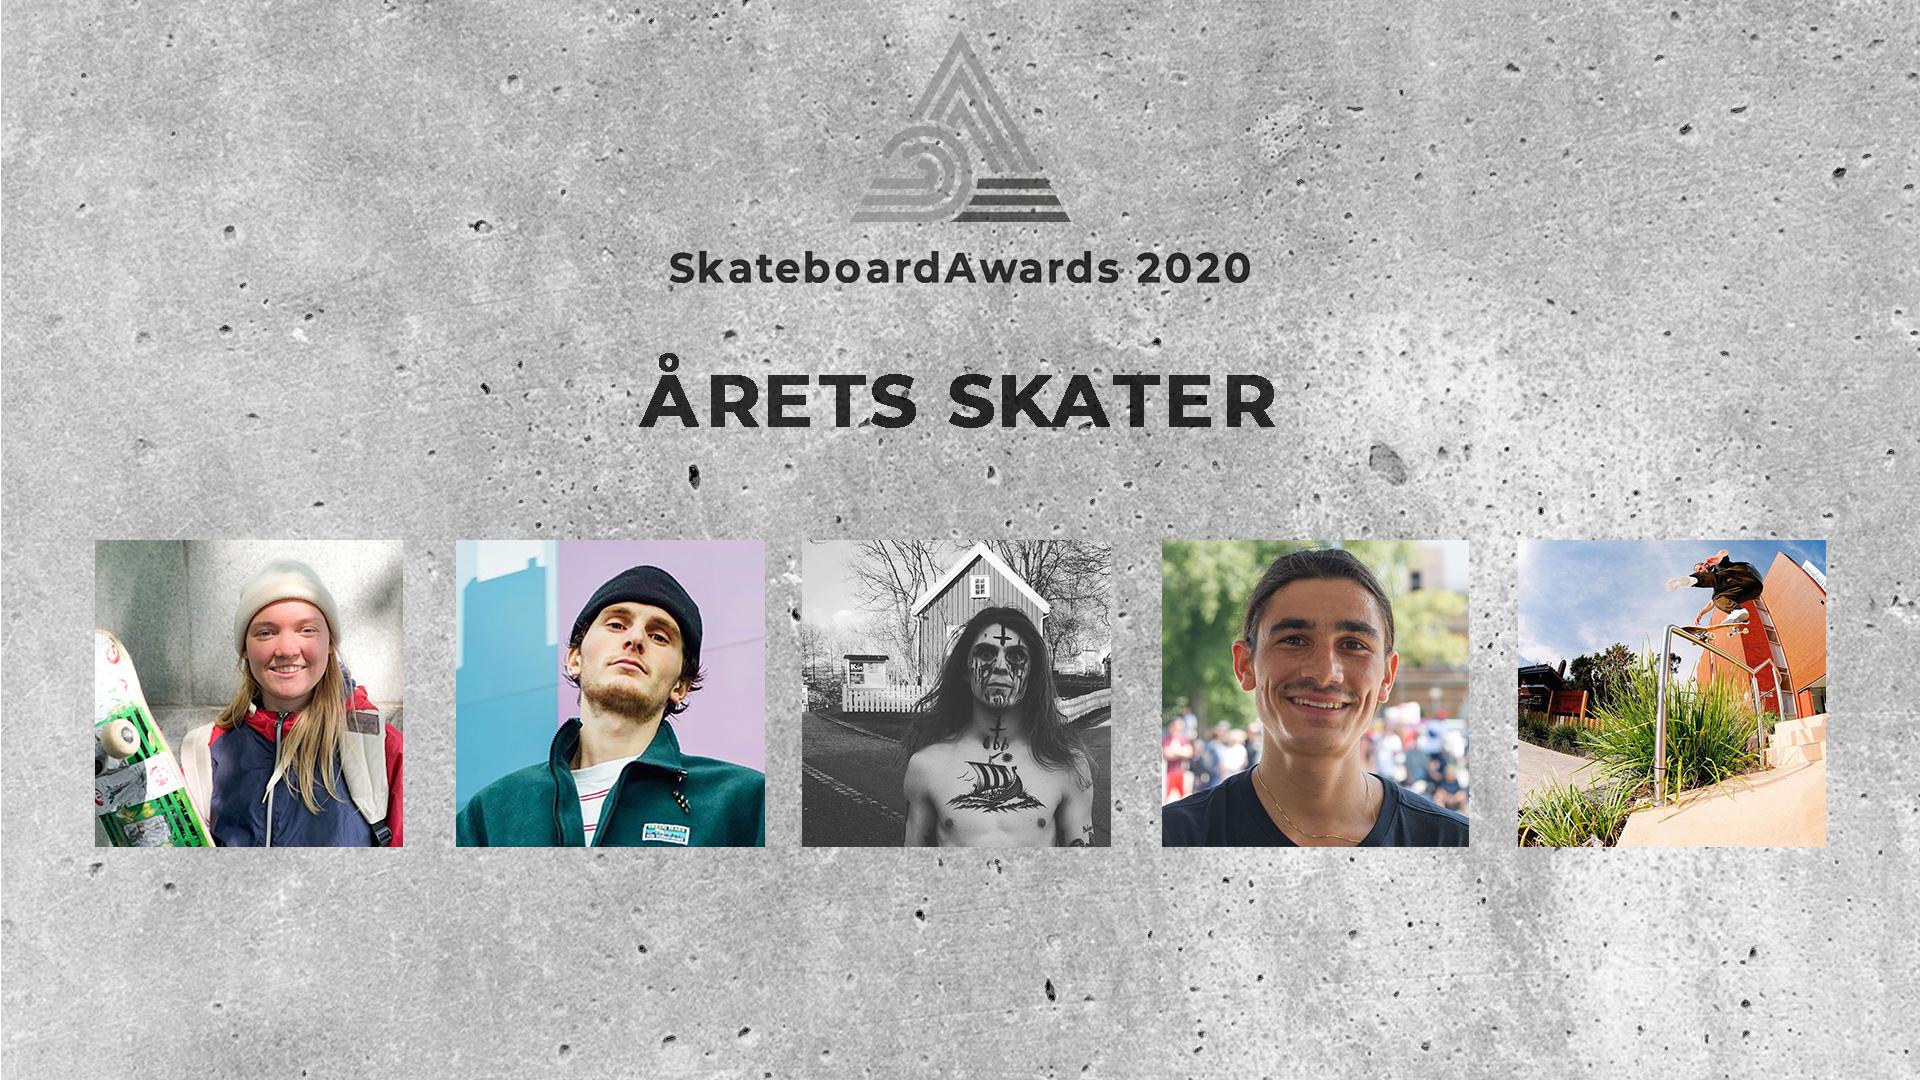 Stem på årets skater!